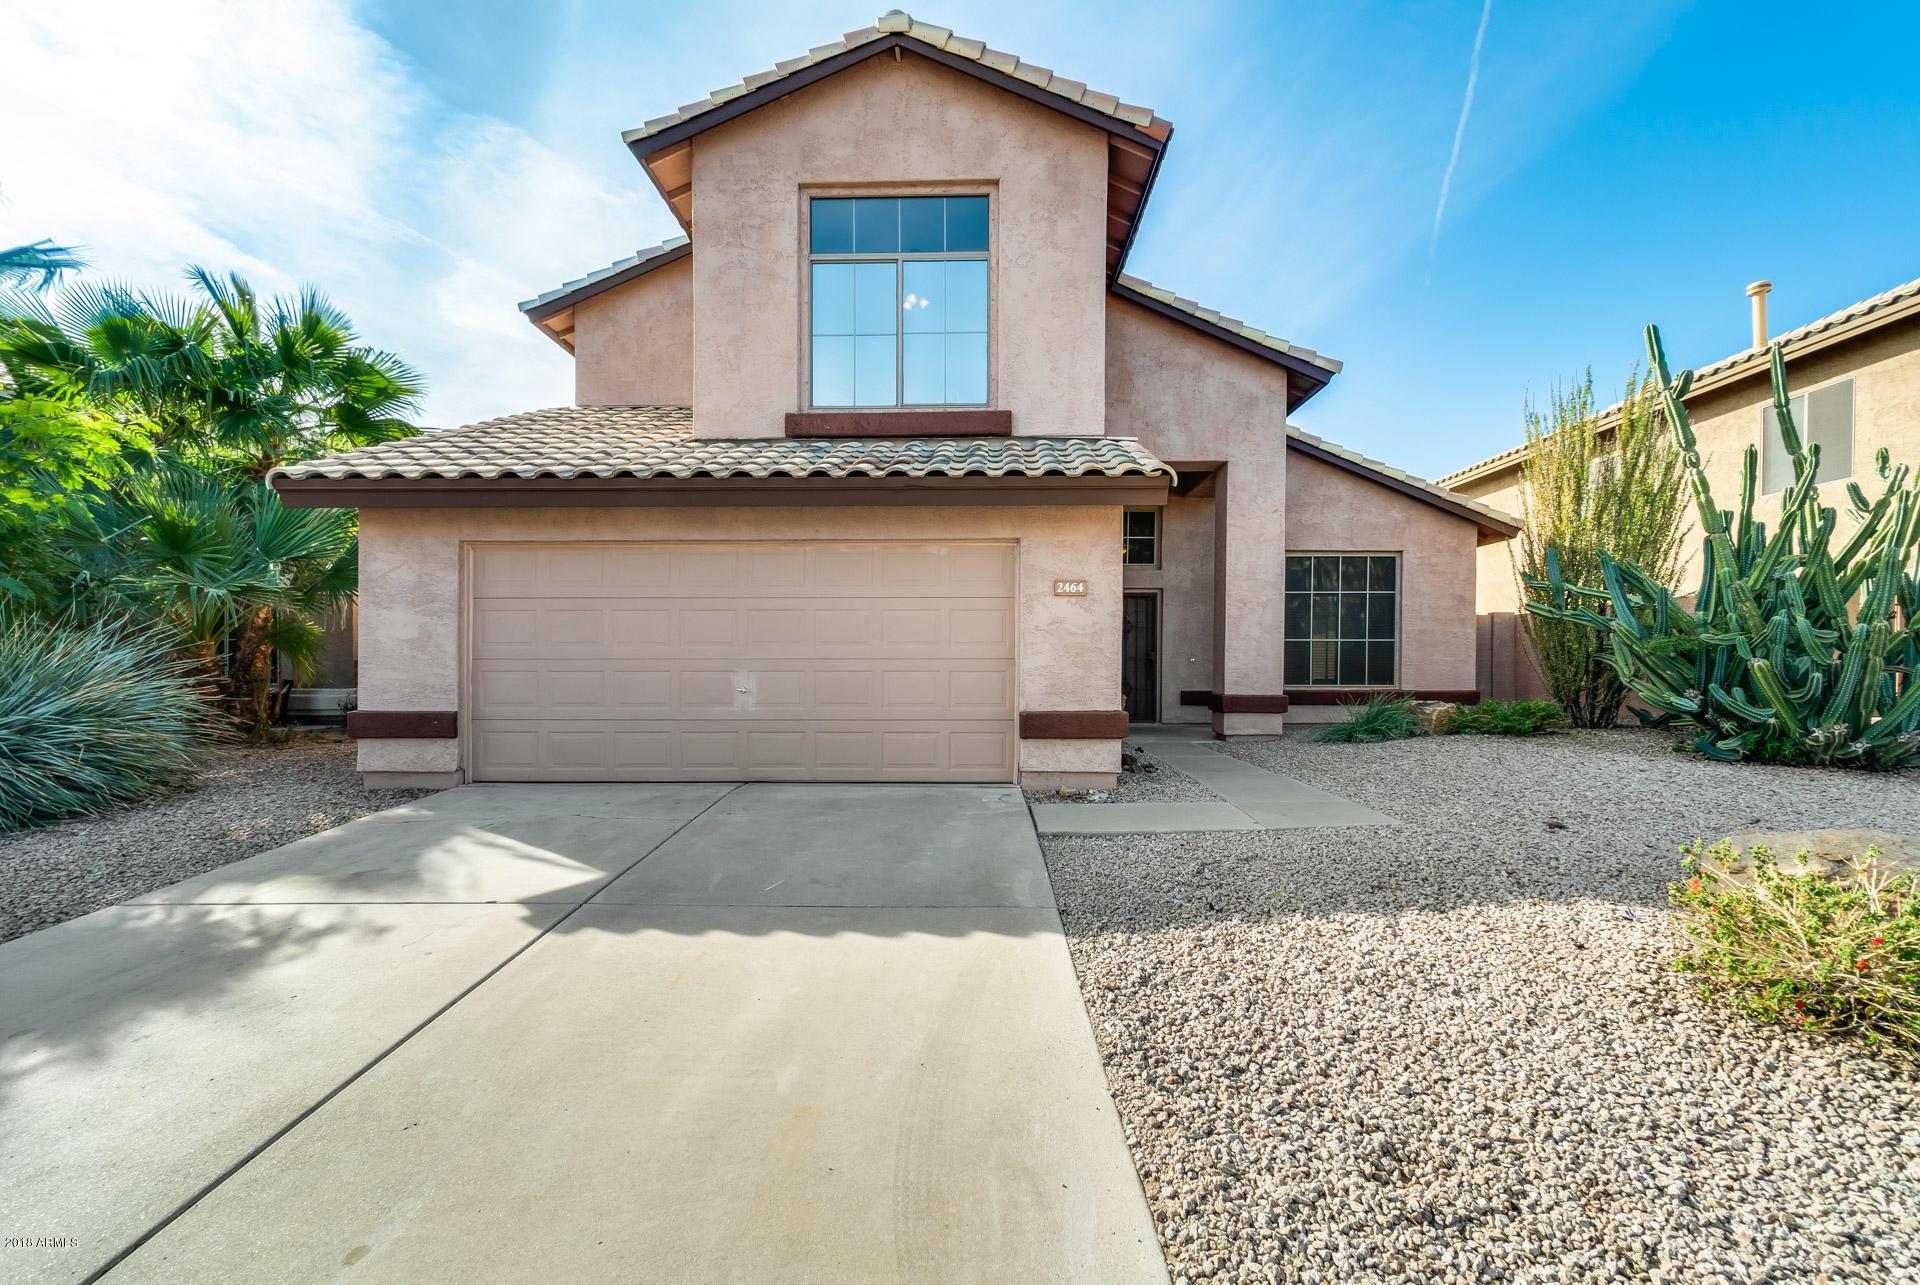 Photo of 2464 S TERRIPIN --, Mesa, AZ 85209